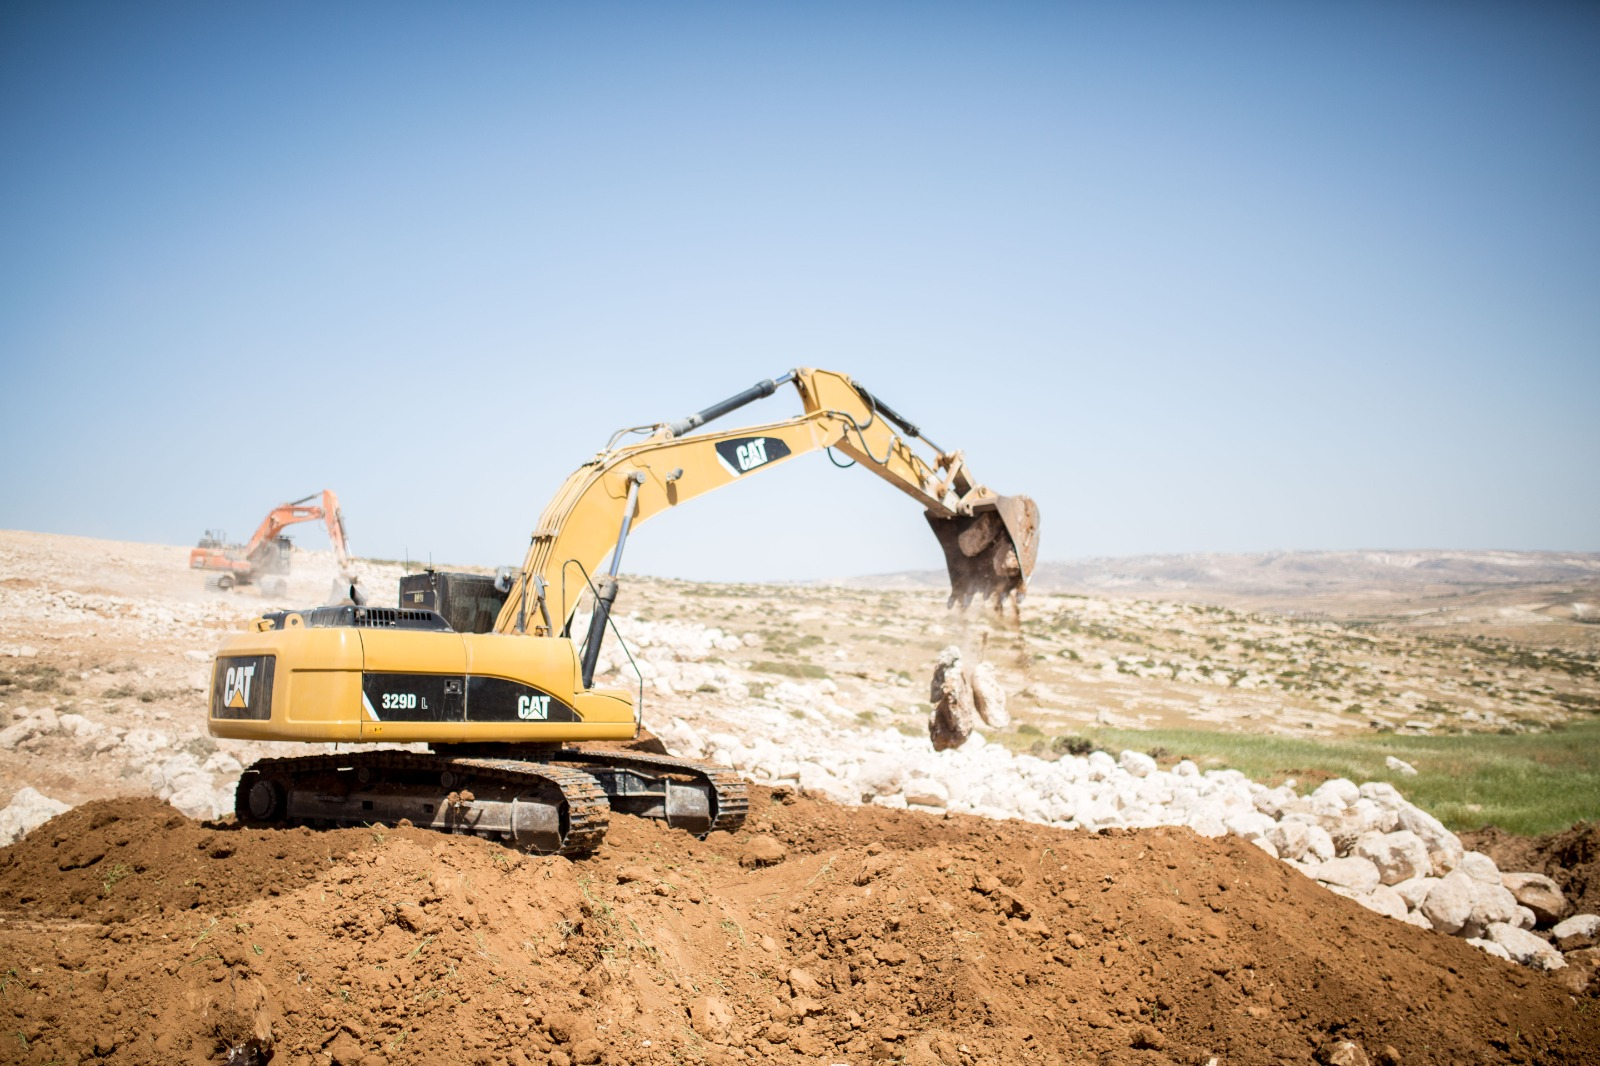 Israeli bulldozers at work in Ein al-Beida, West Bank, April 15, 2021. (Emily Glick)